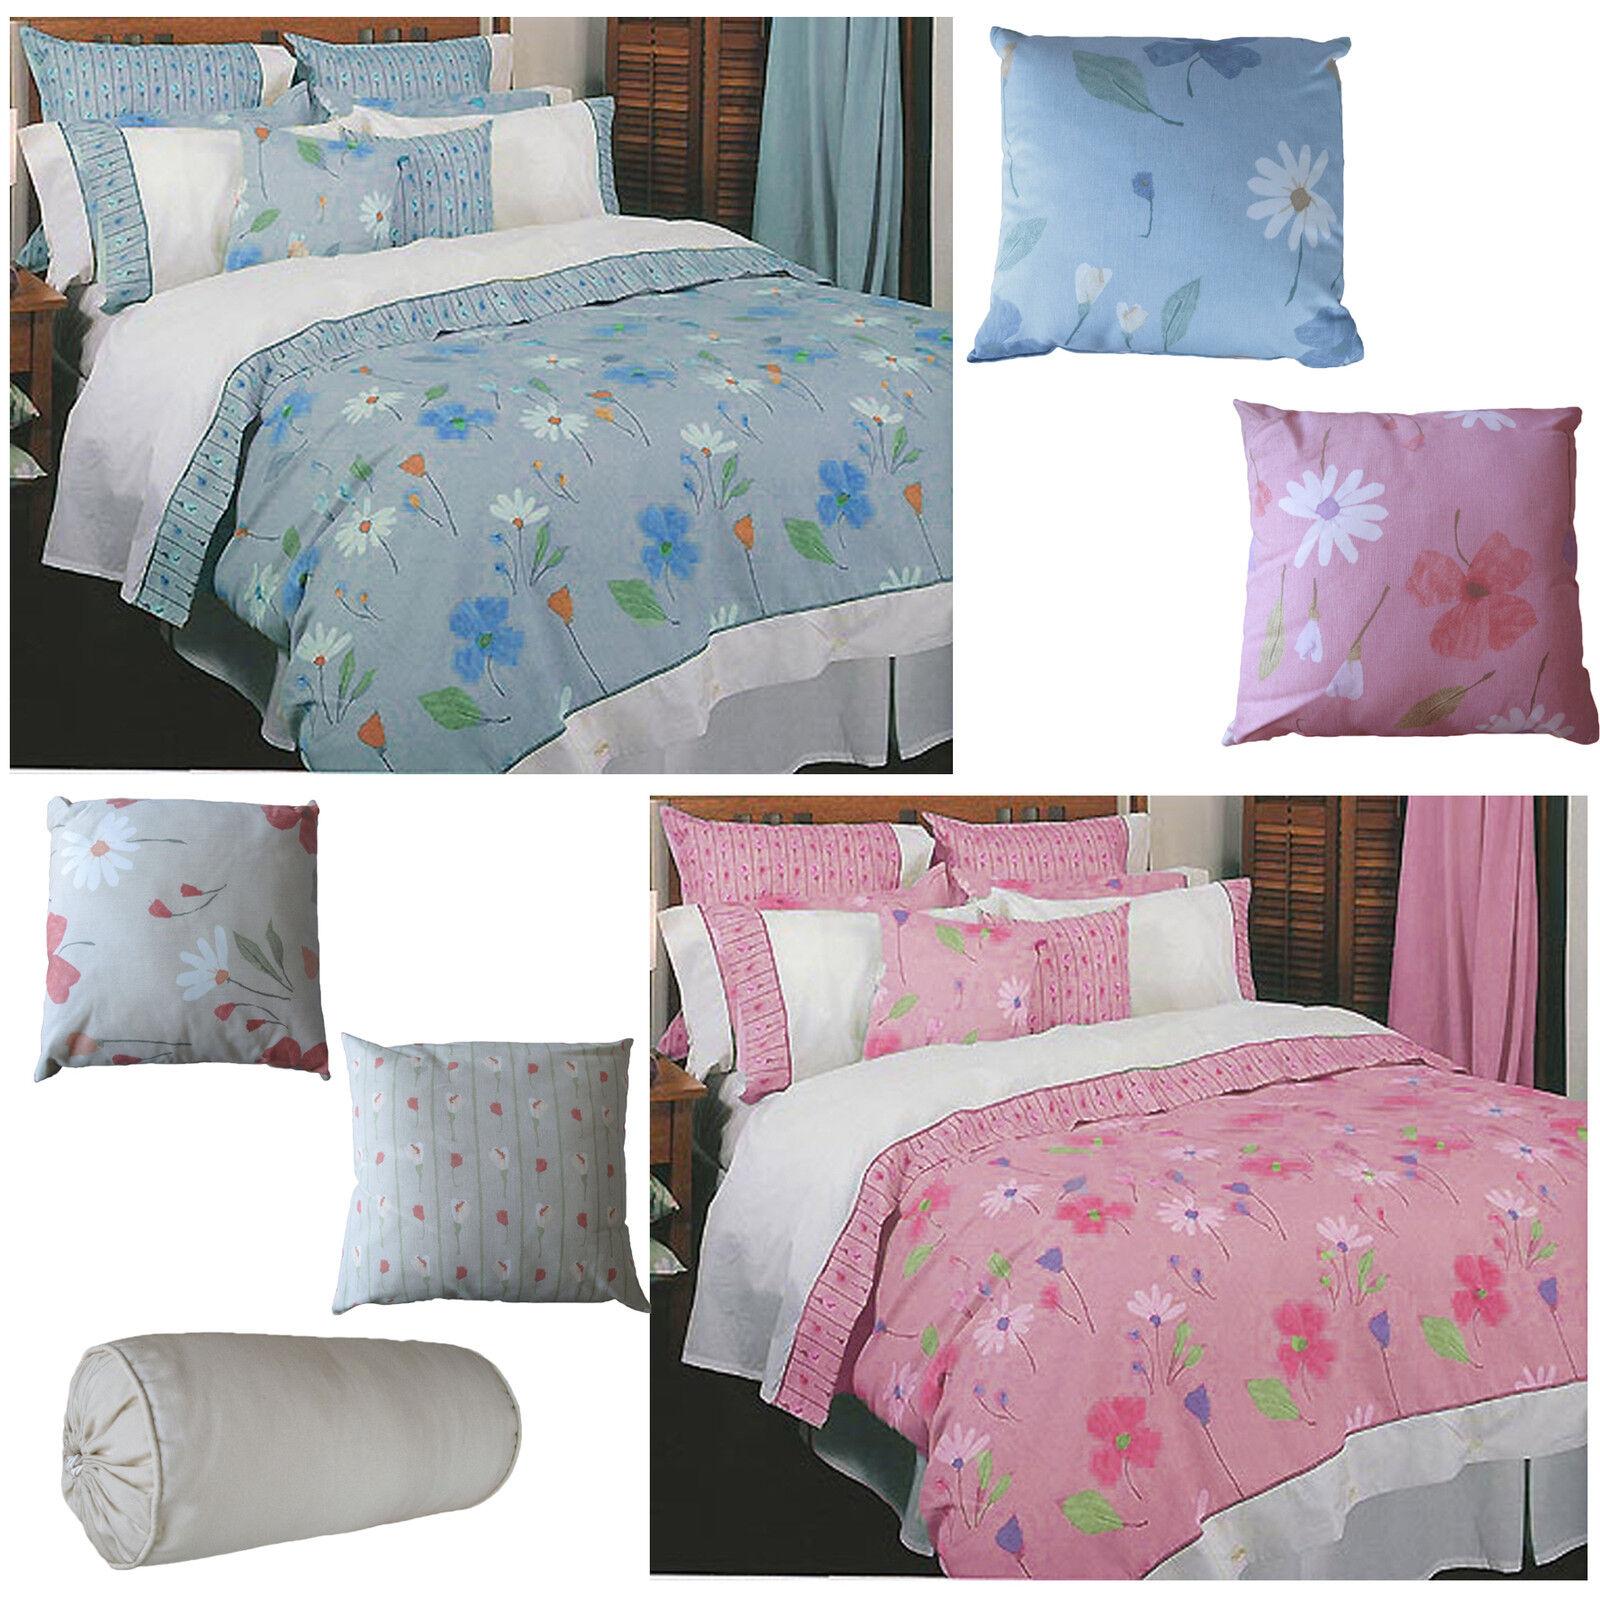 QUALITY Italian Fabric 100% Cotton Daisy Quilt Doona Duvet Cover Set QUEEN KING